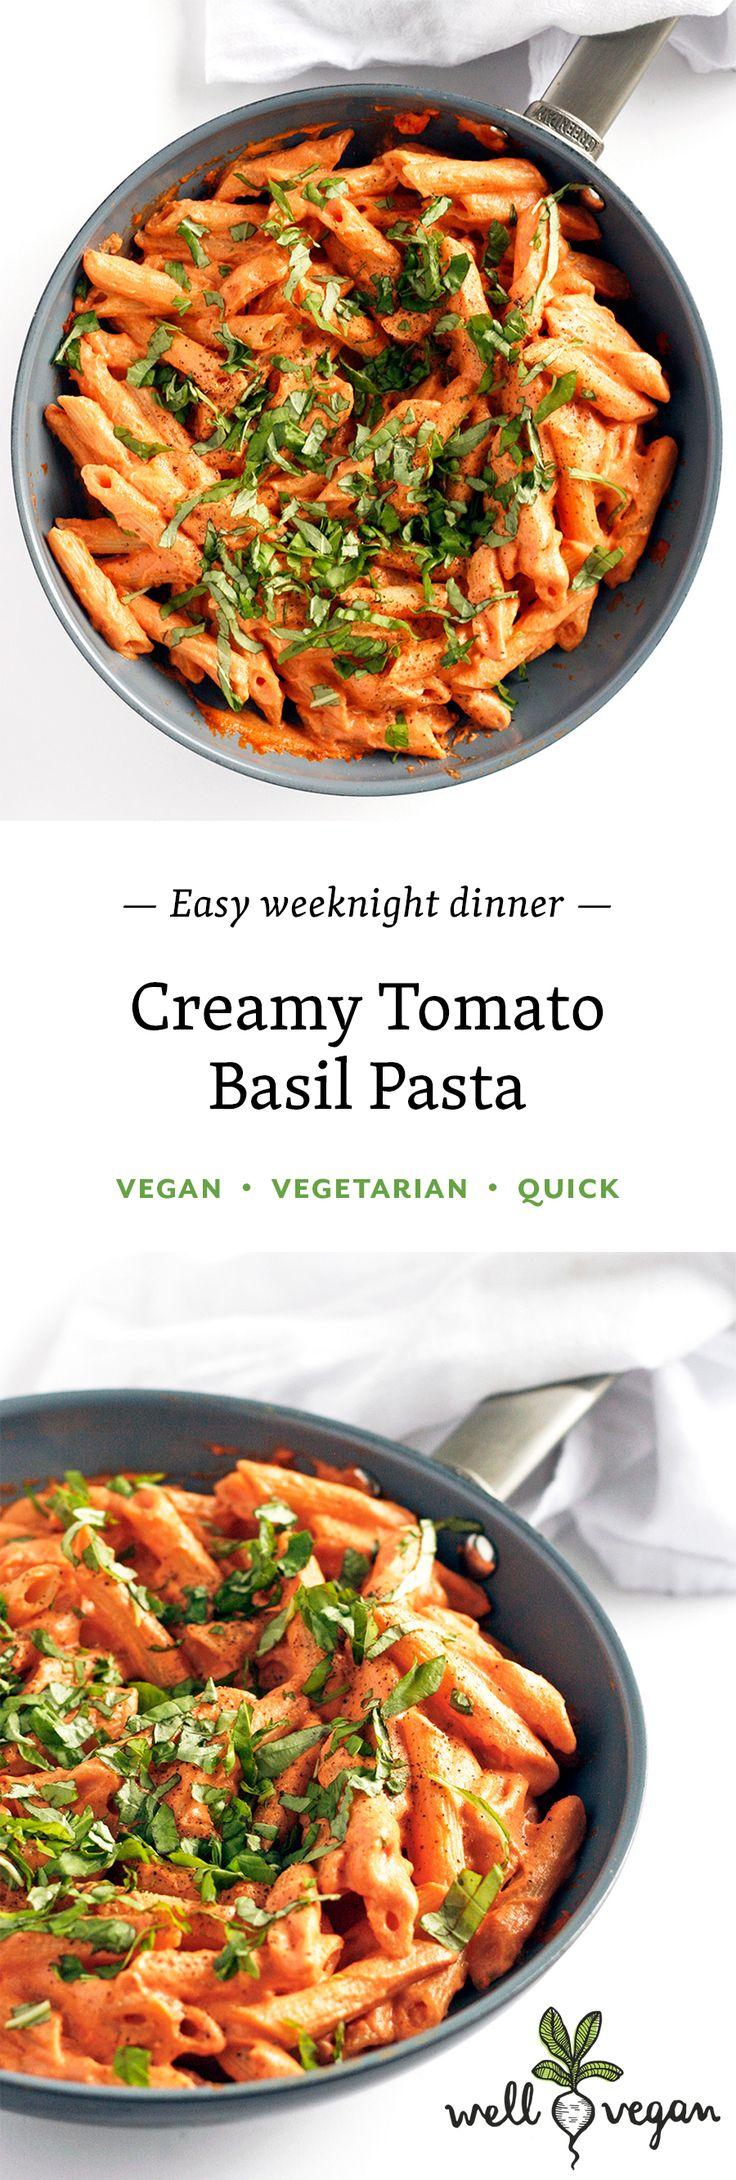 Creamy Tomato Basil Pasta // Vegan + Vegetarian + Easy + Quick